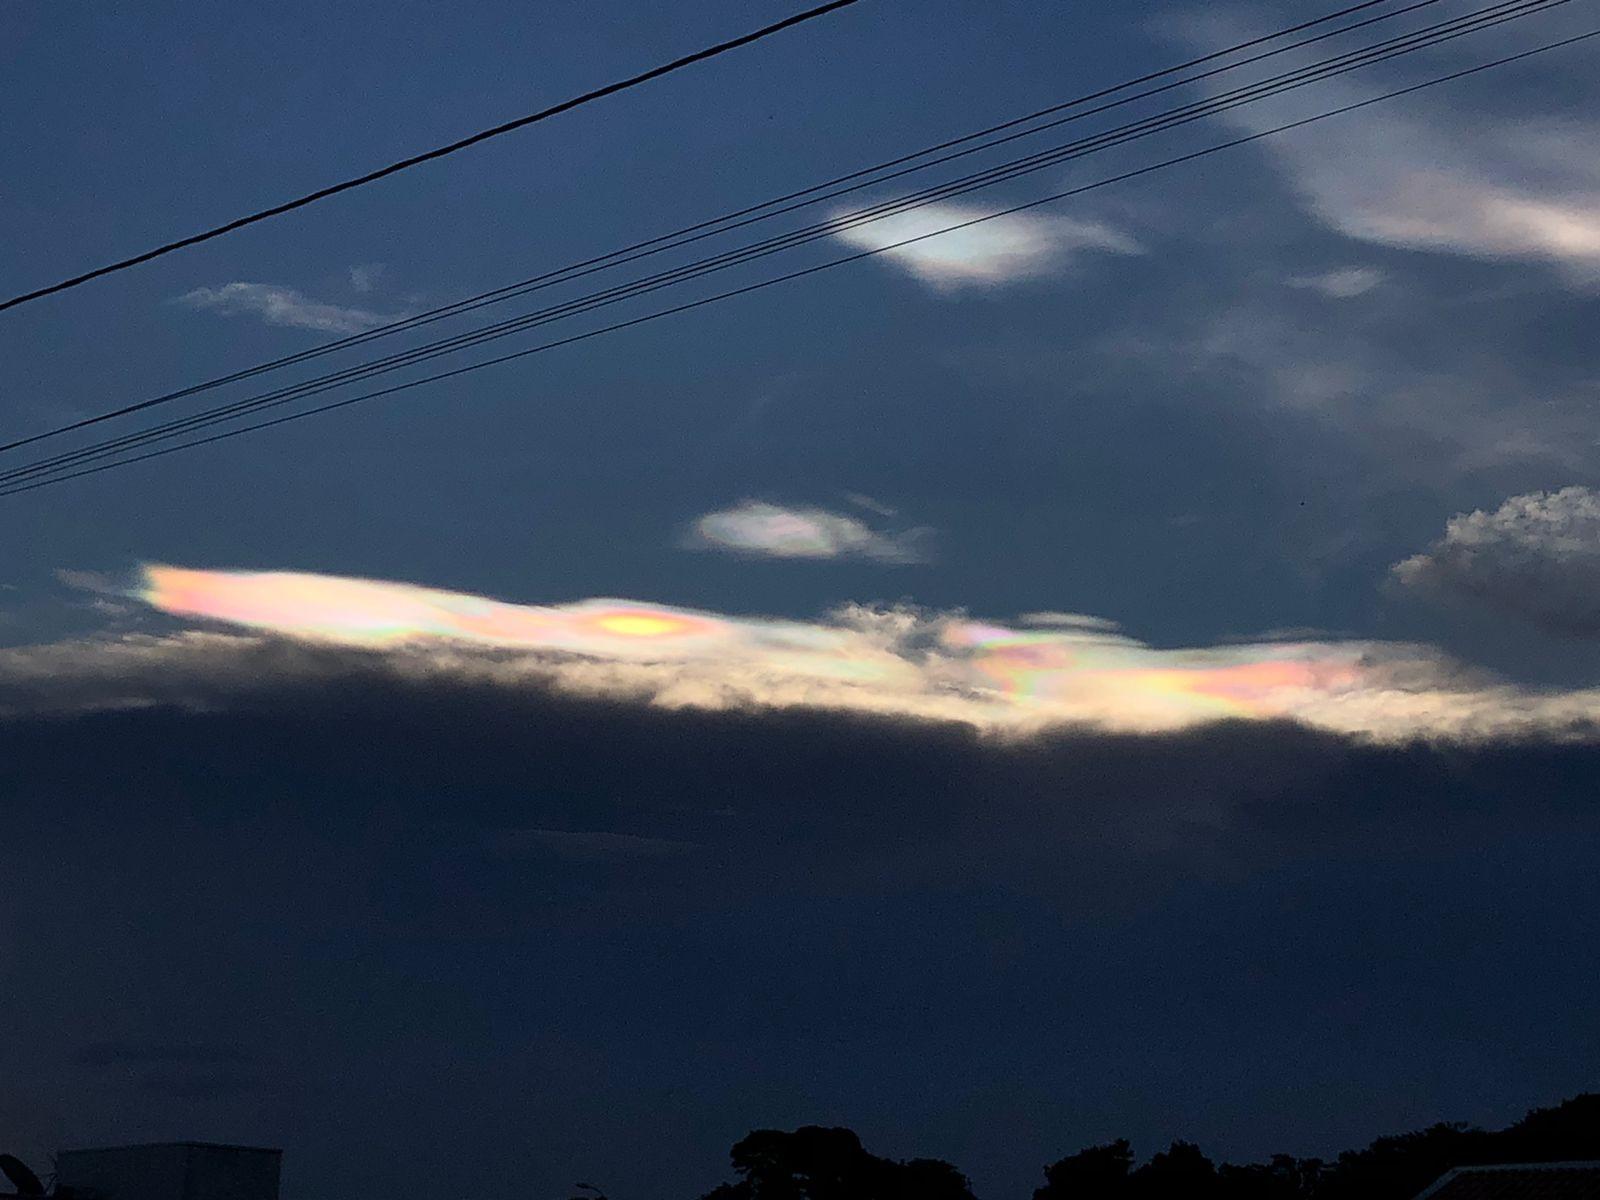 Fenômeno que deixa nuvens coloridas é registrado por moradores de Vilhena, RO